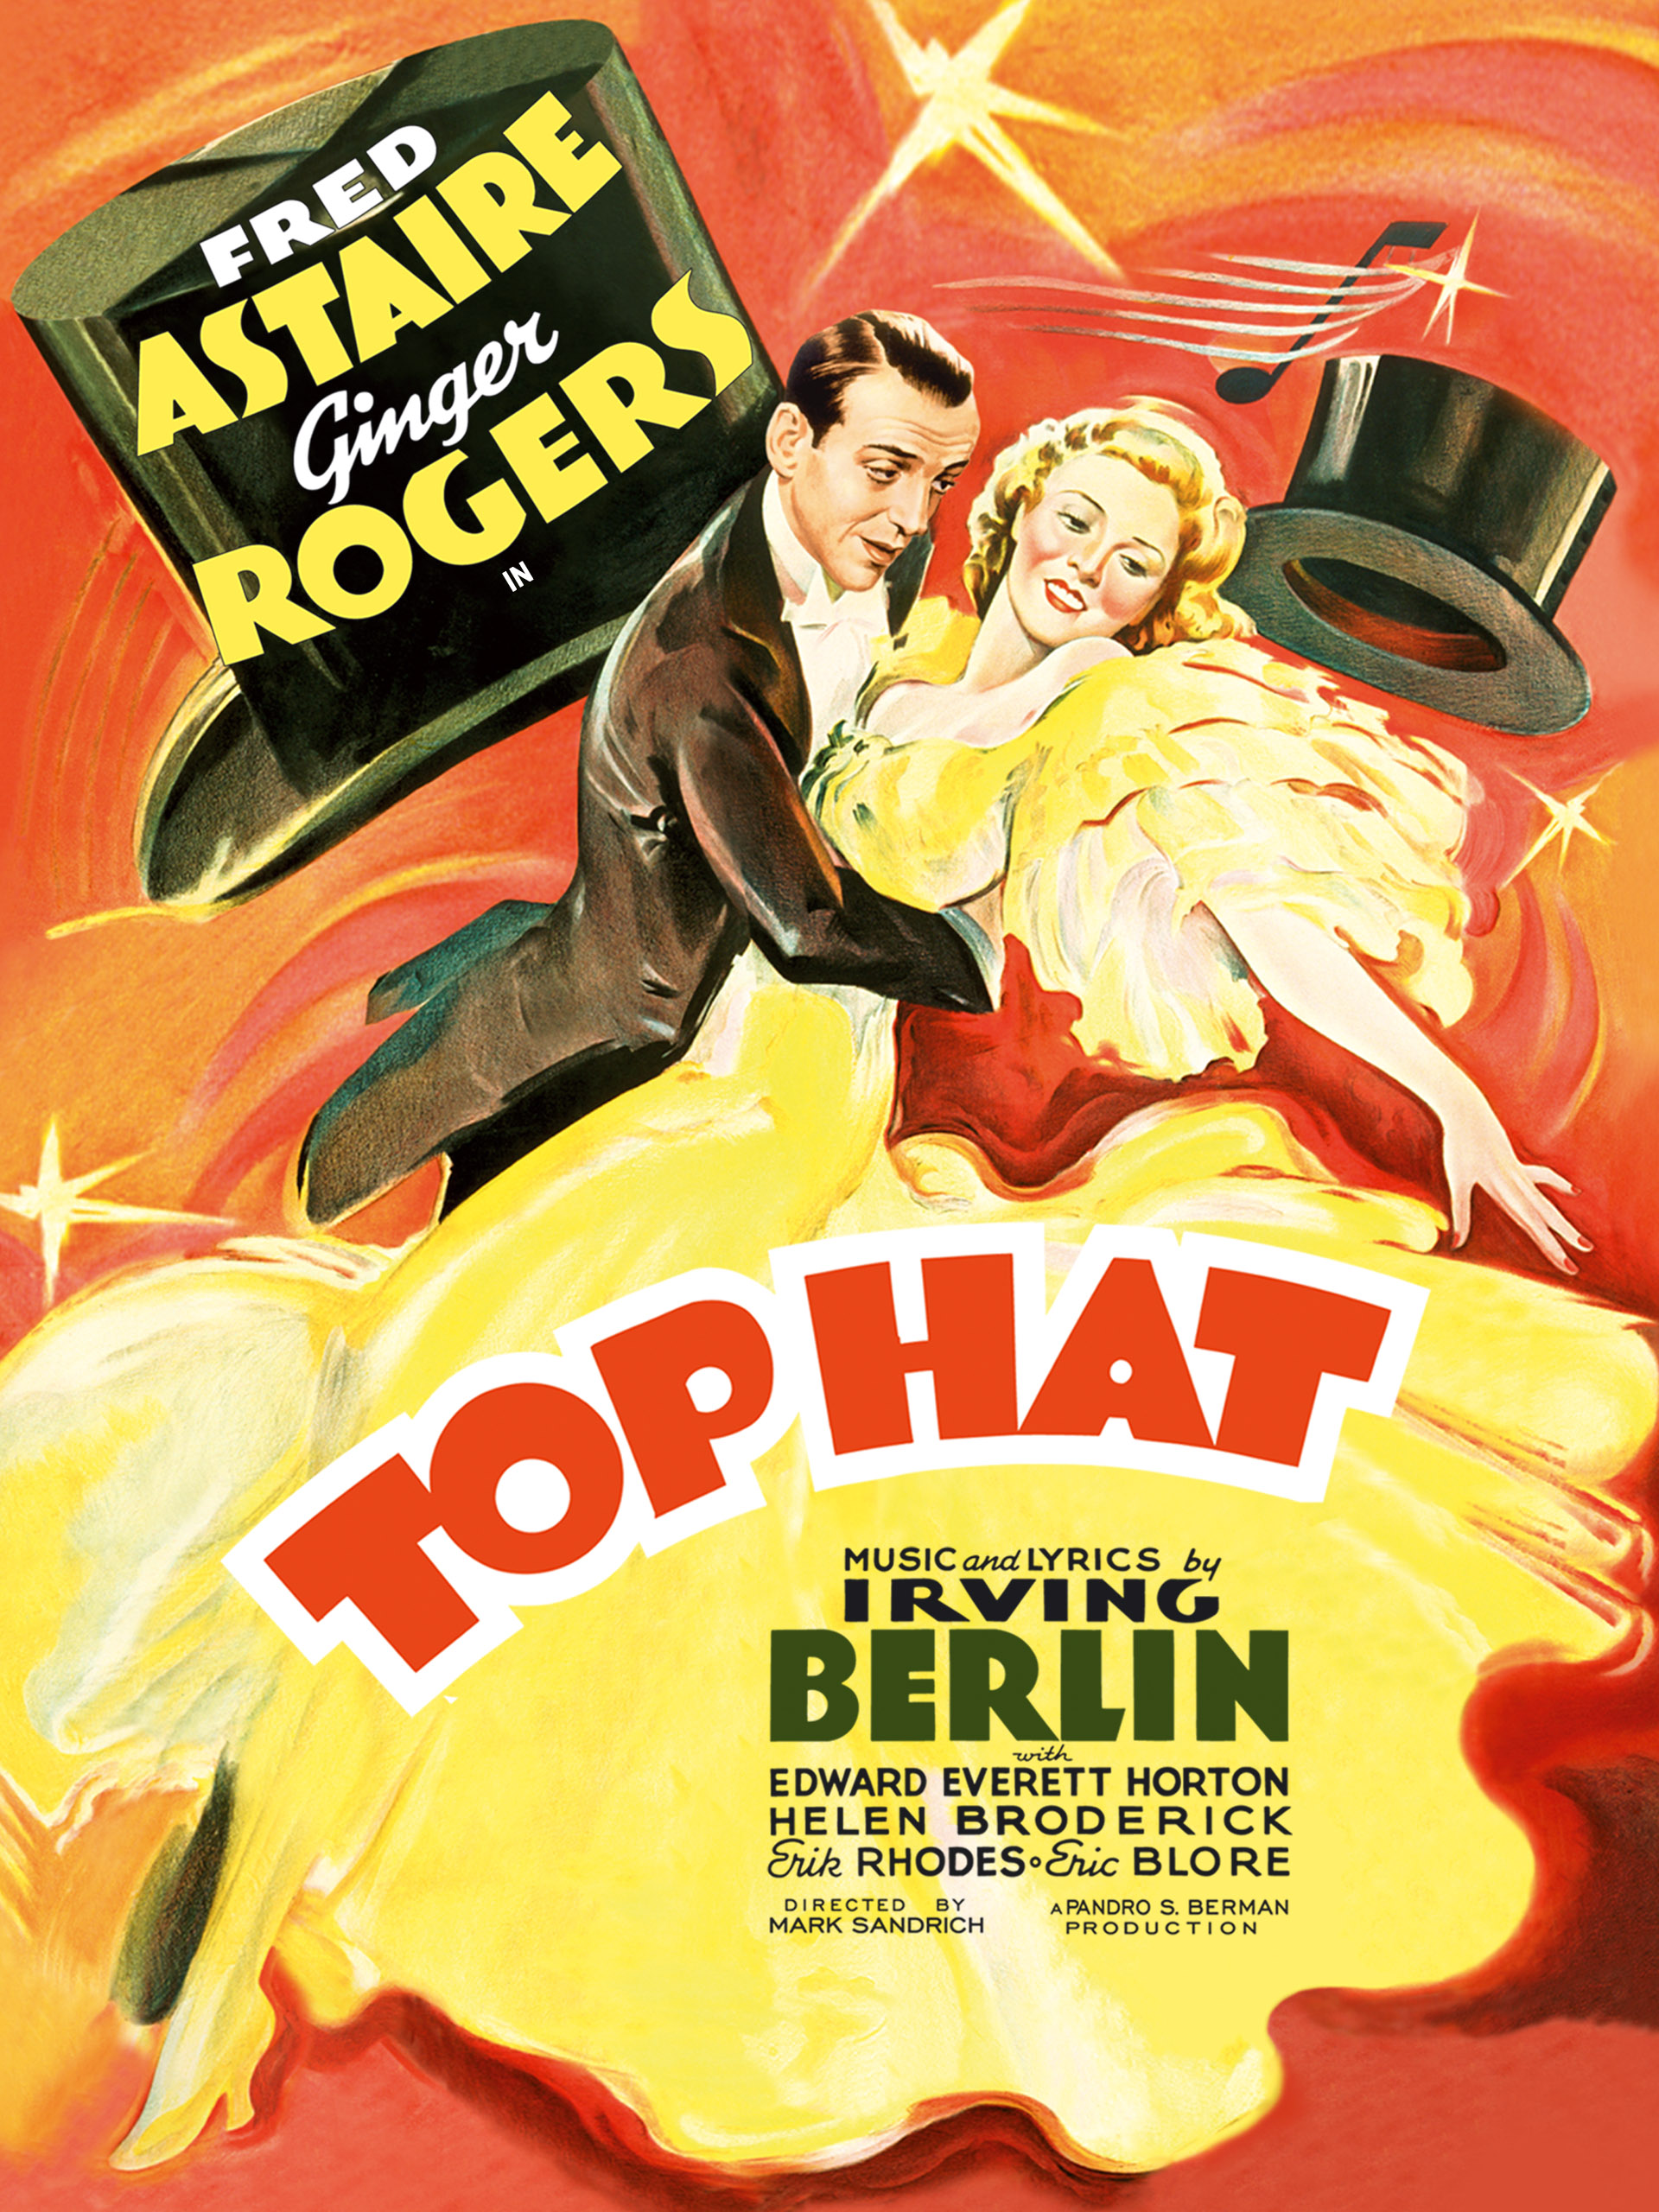 مشاهدة فيلم Top Hat 1935 مترجم